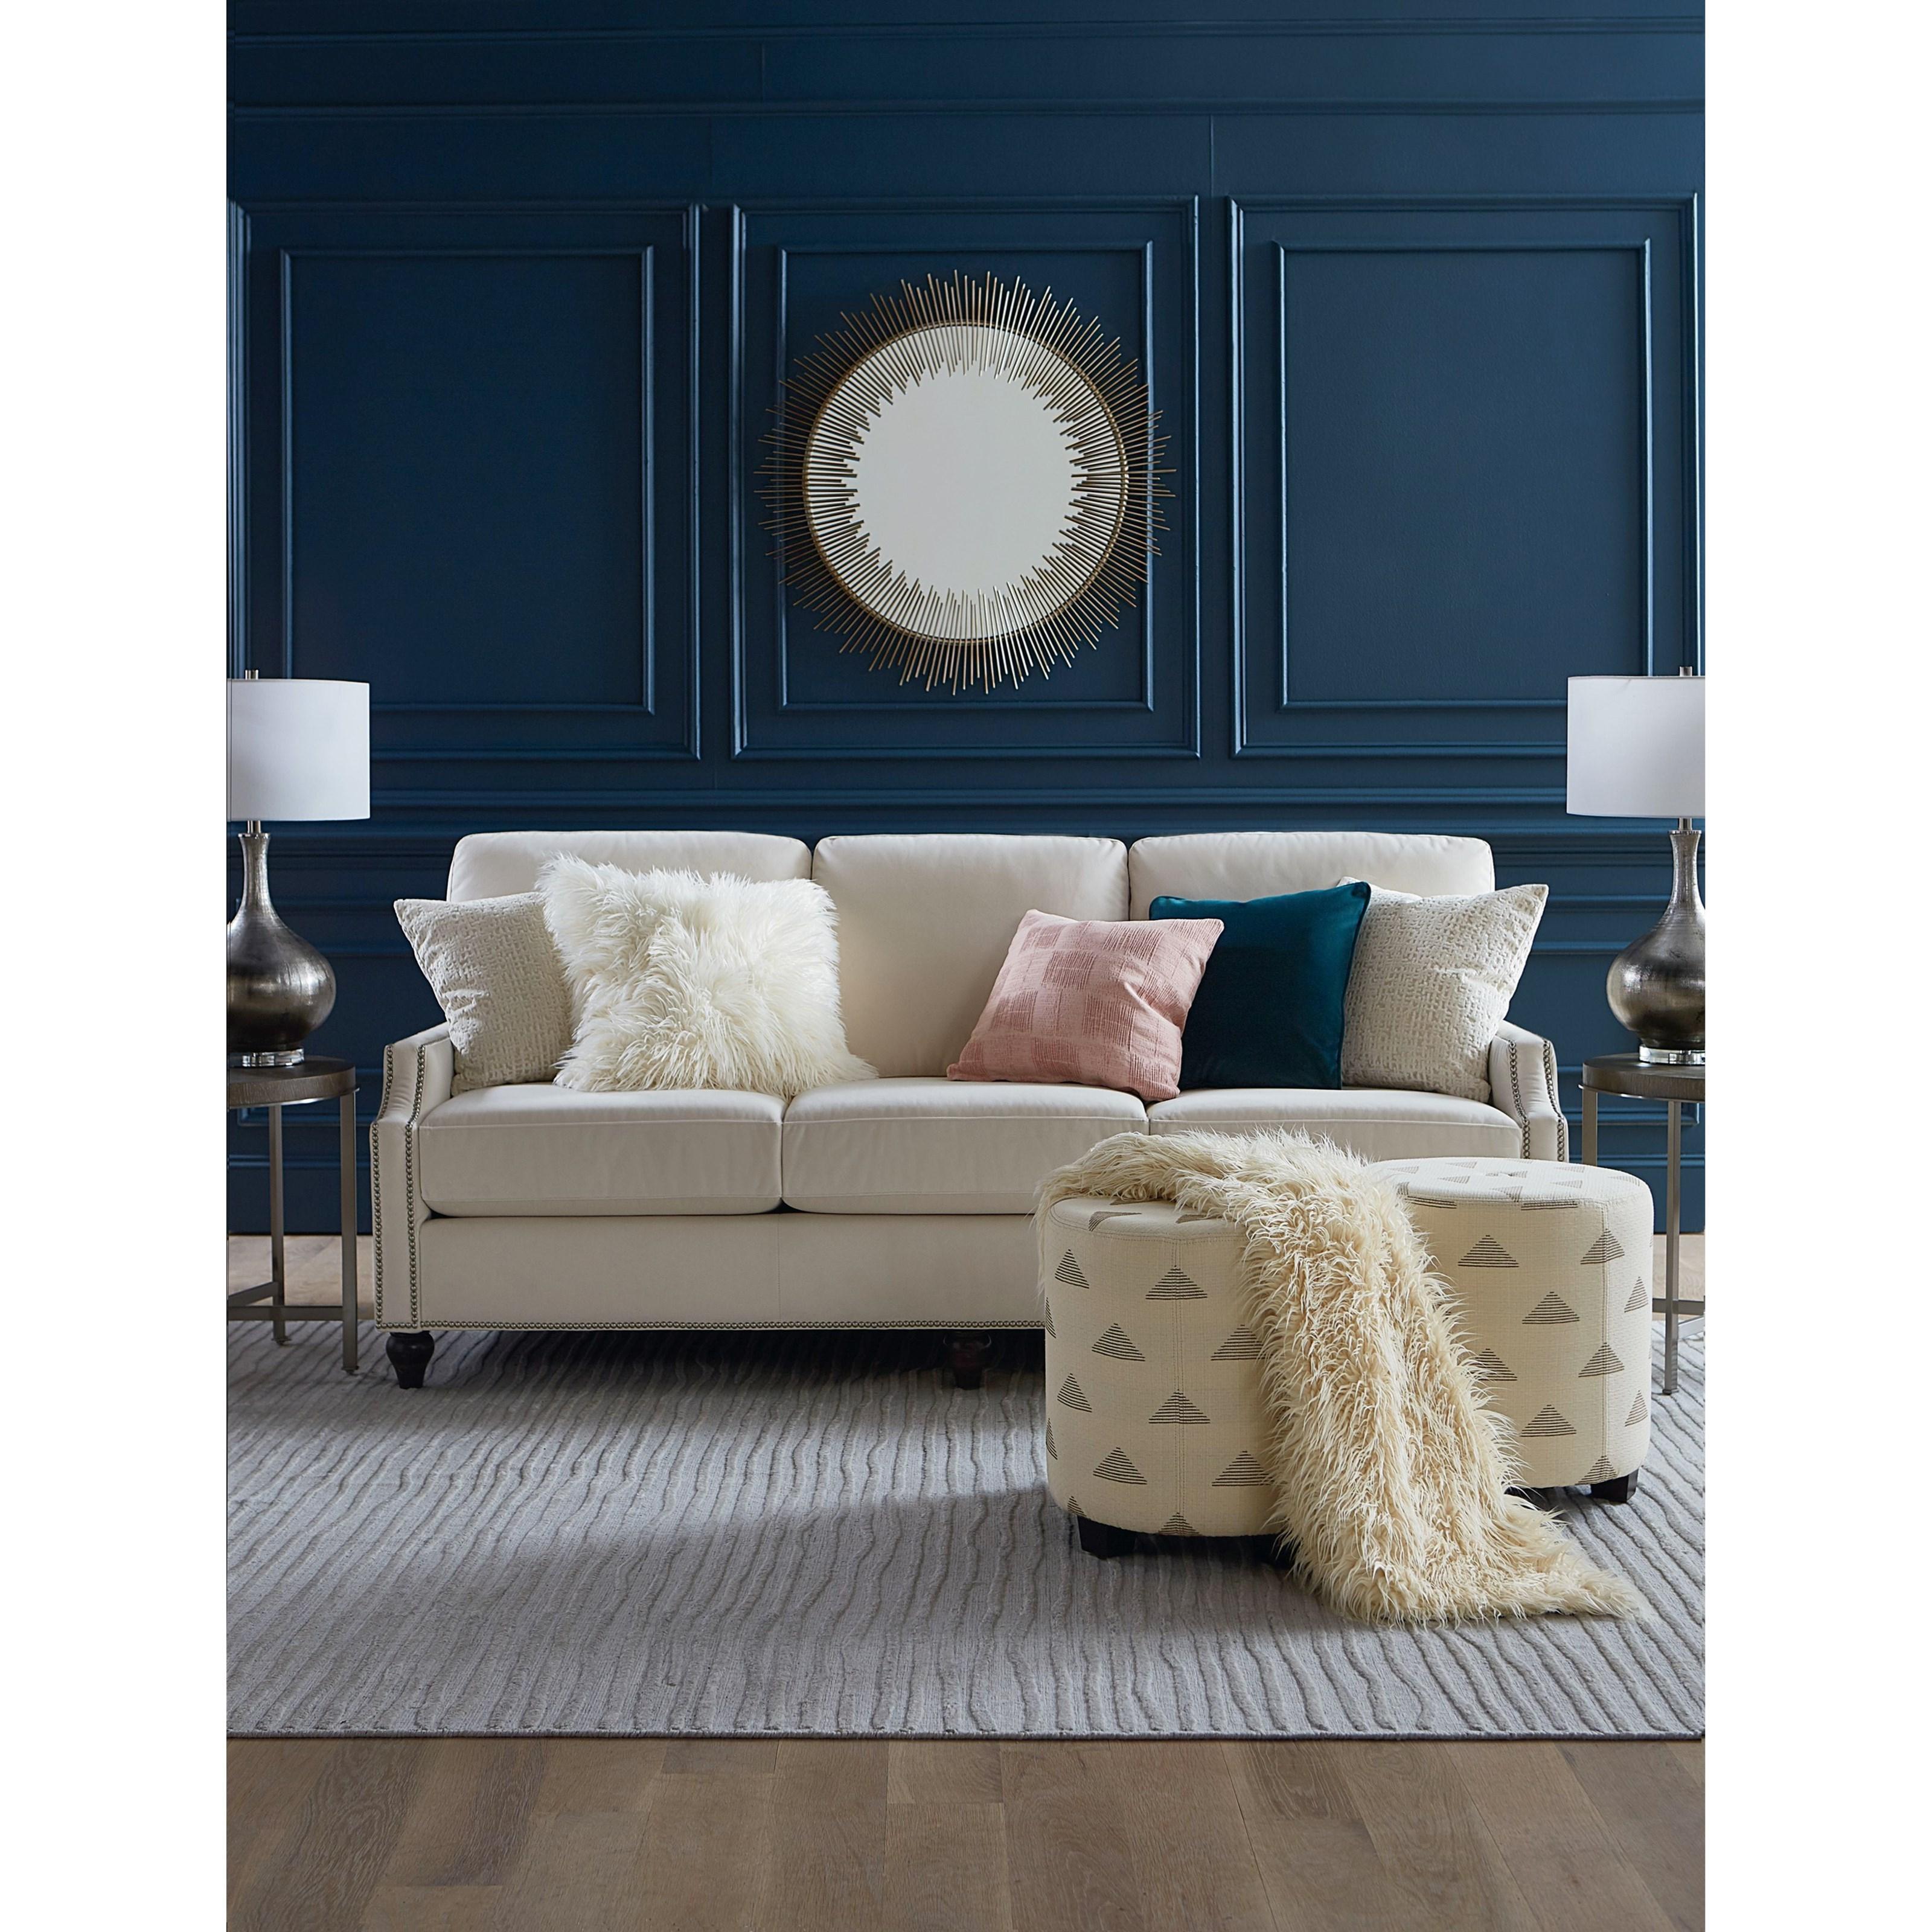 Custom Upholstery Customizable Classic Sofa by Bassett at Bassett of Cool Springs